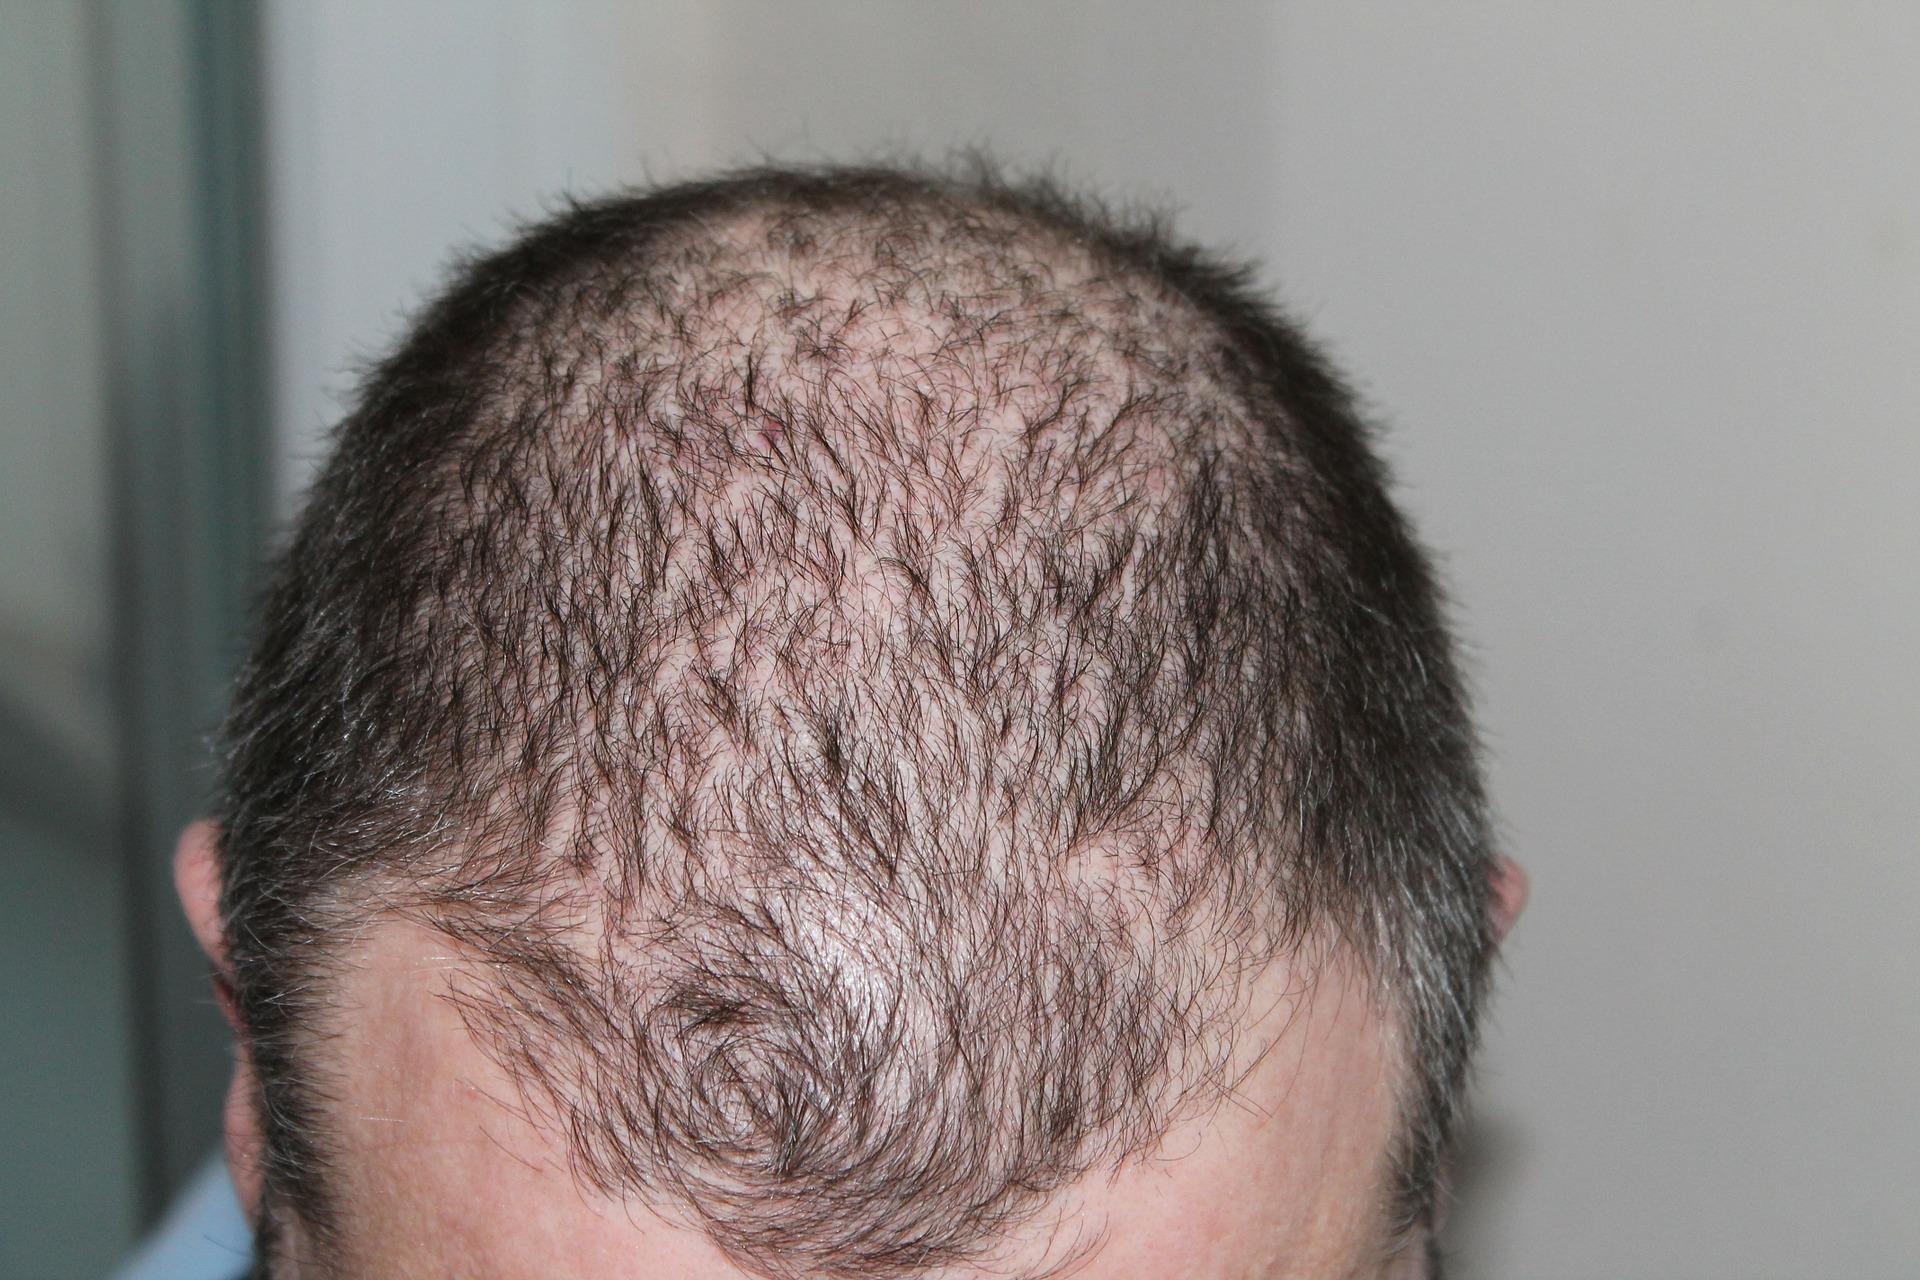 Balding man; image by kalhh, via Pixabay.com.